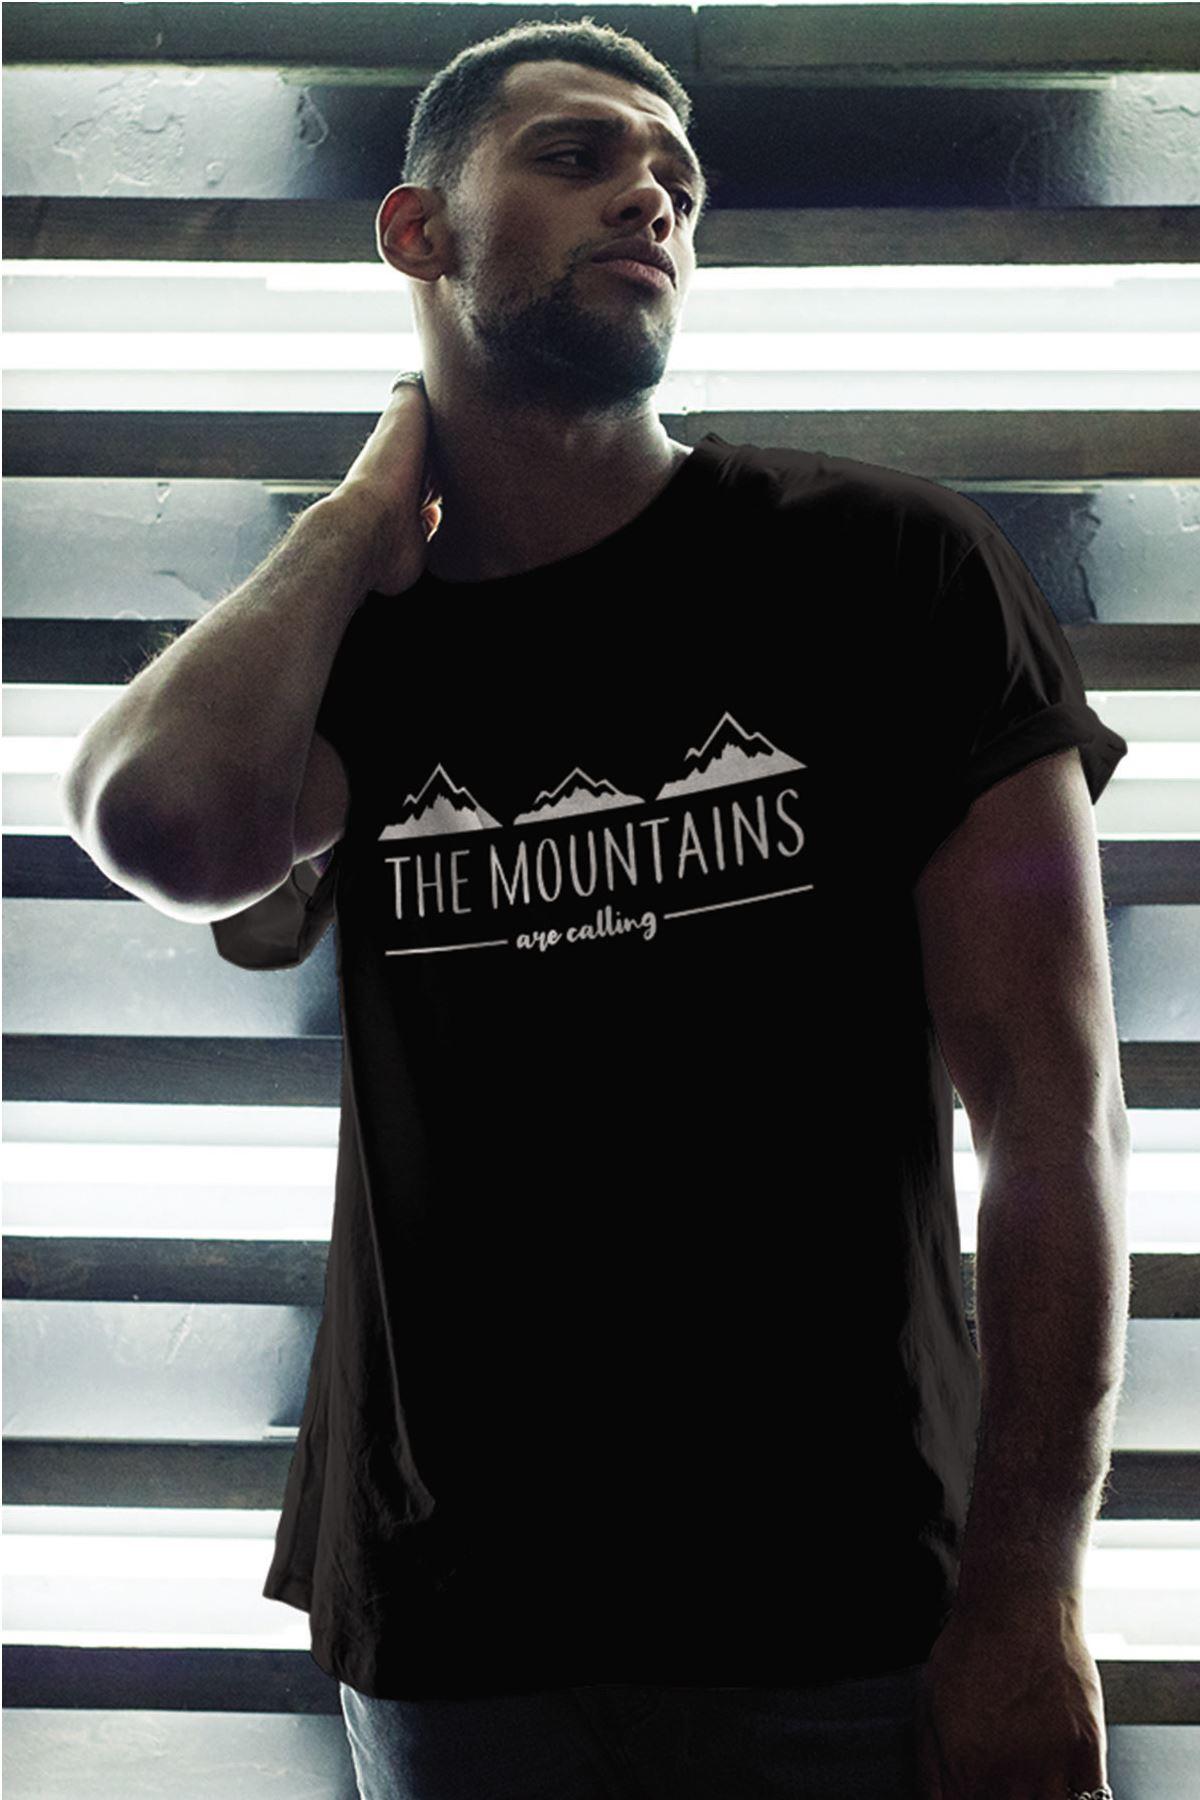 Mountain Siyah Erkek Oversize Tshirt - Tişört